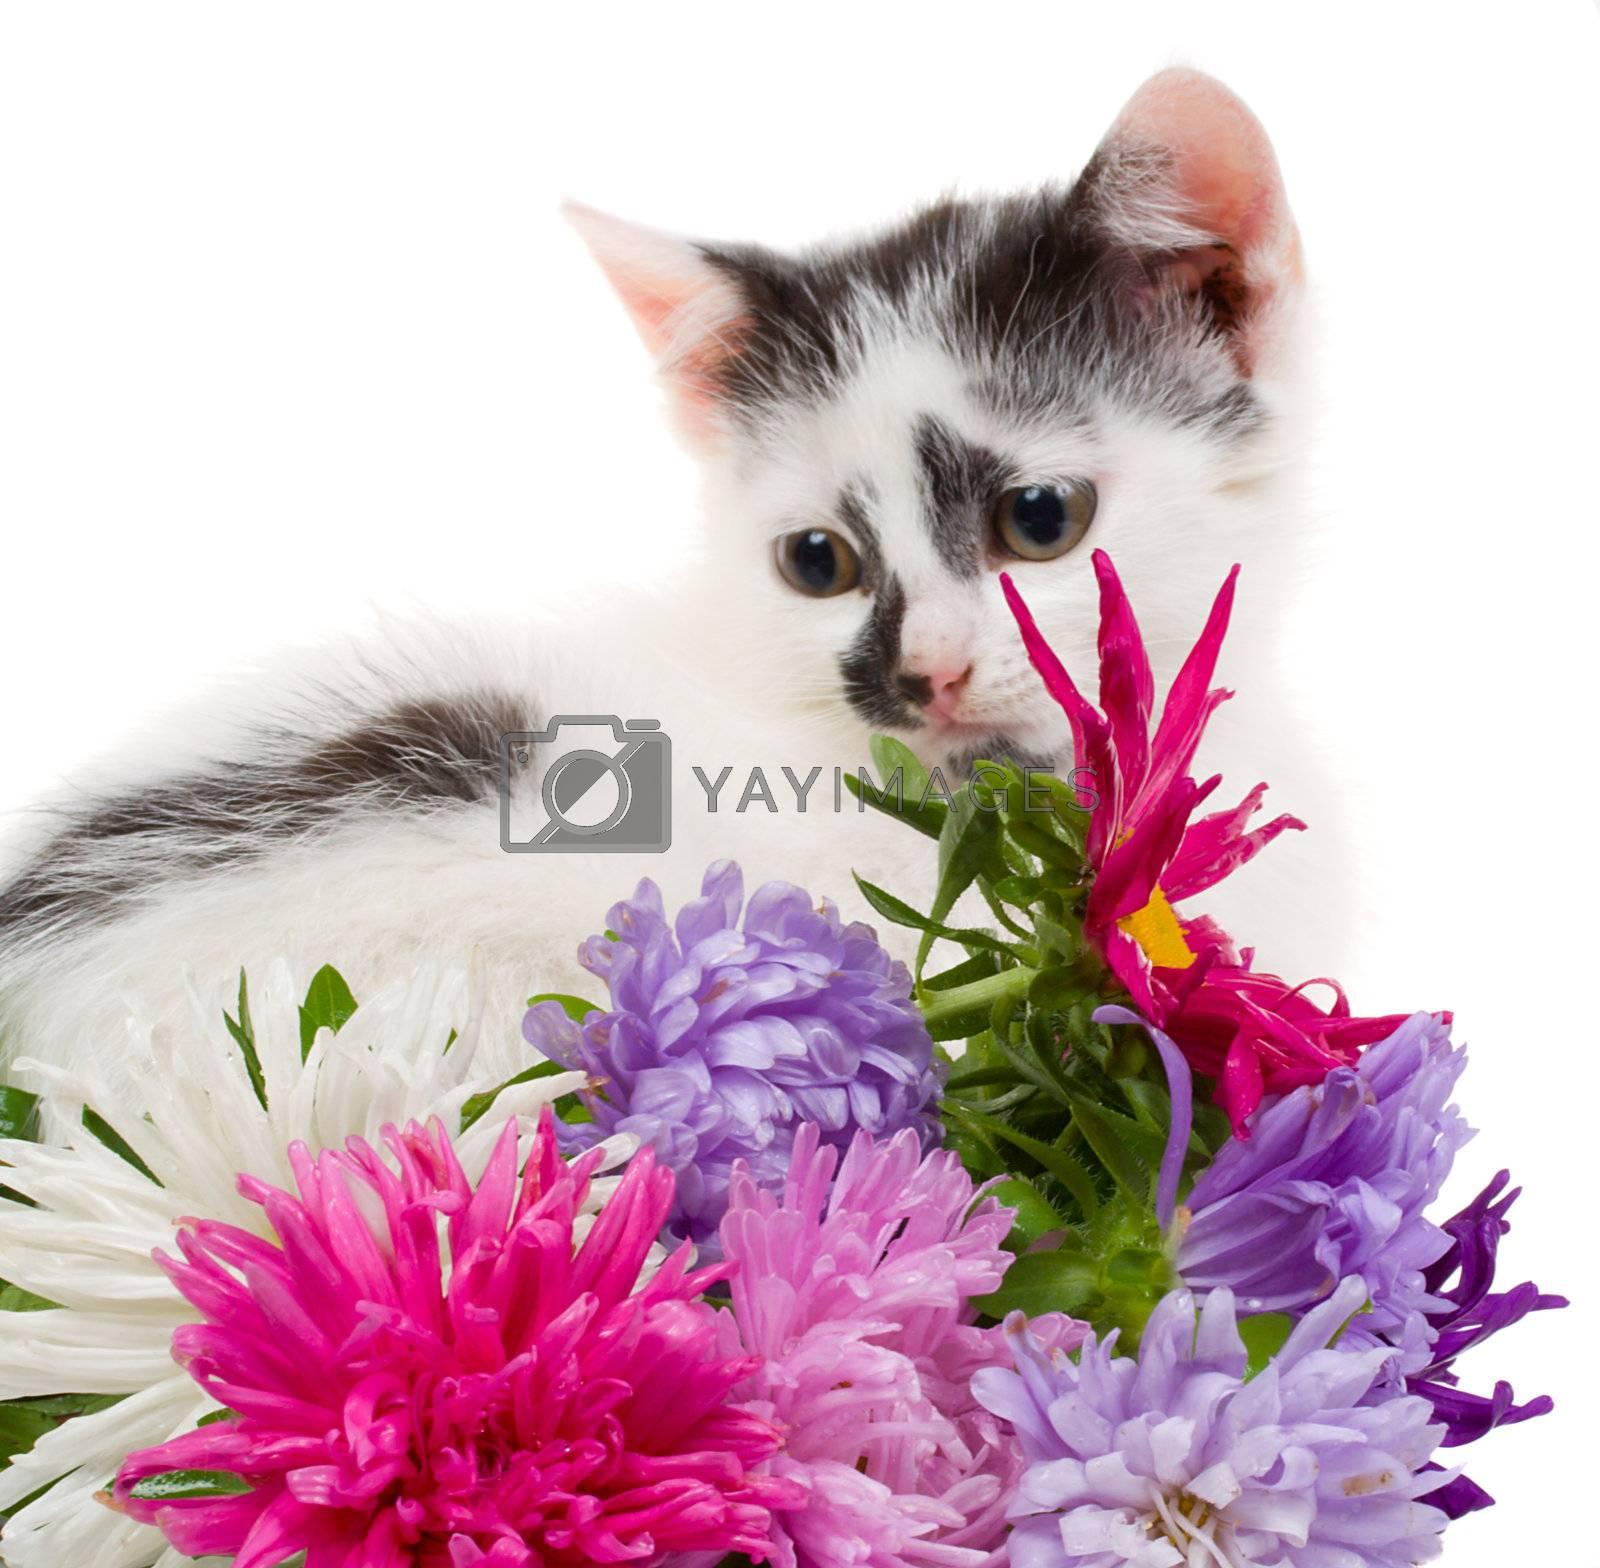 small kitten sitting near flowers, isolated on white